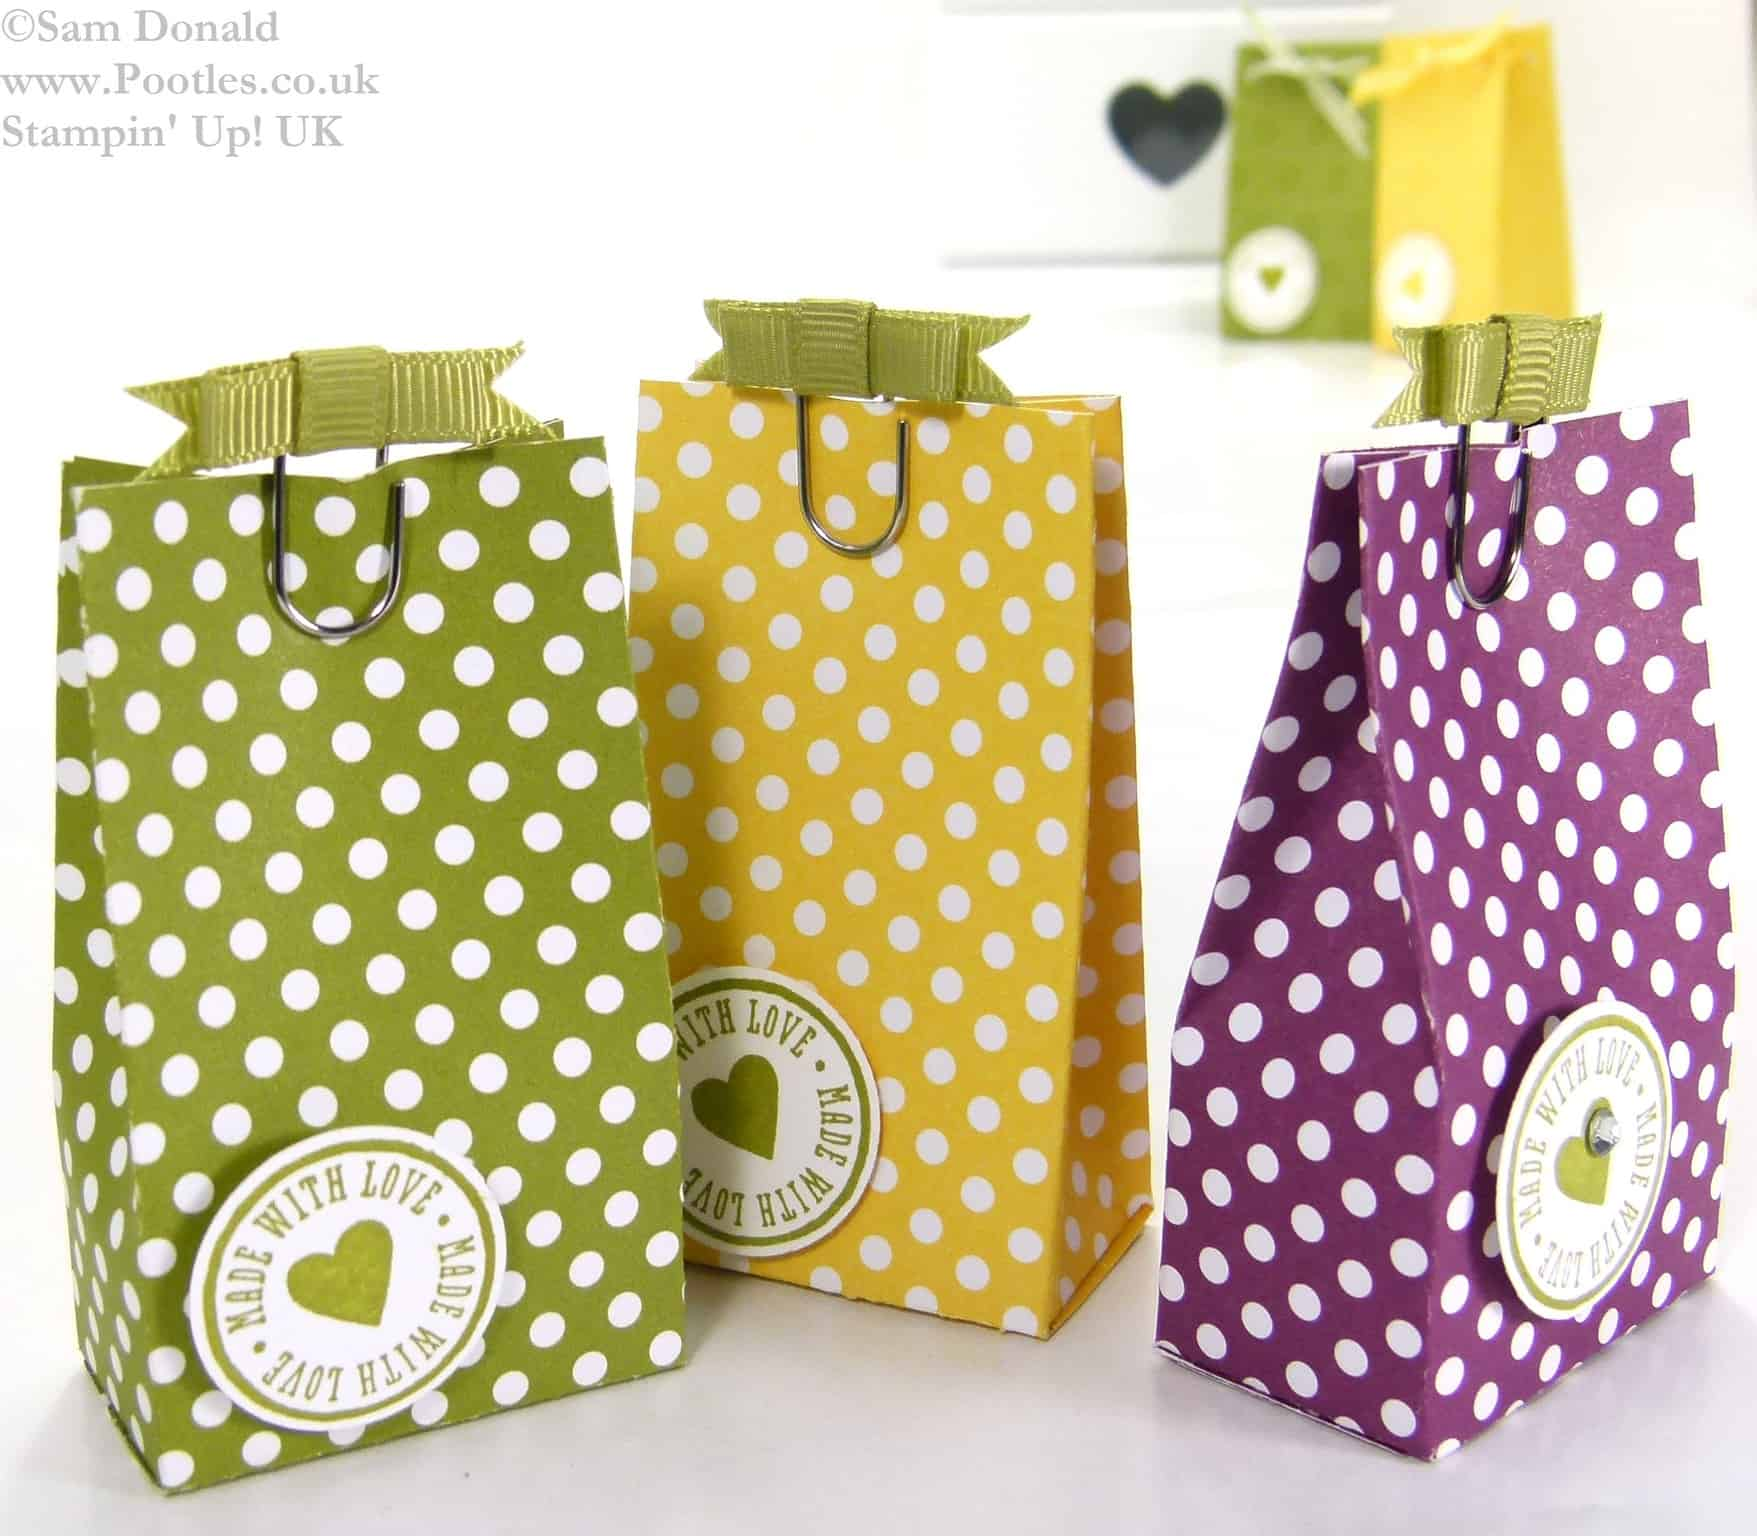 POOTLES Stampin Up UK Polka Dot Parade 6 bags from one sheet DSP 3